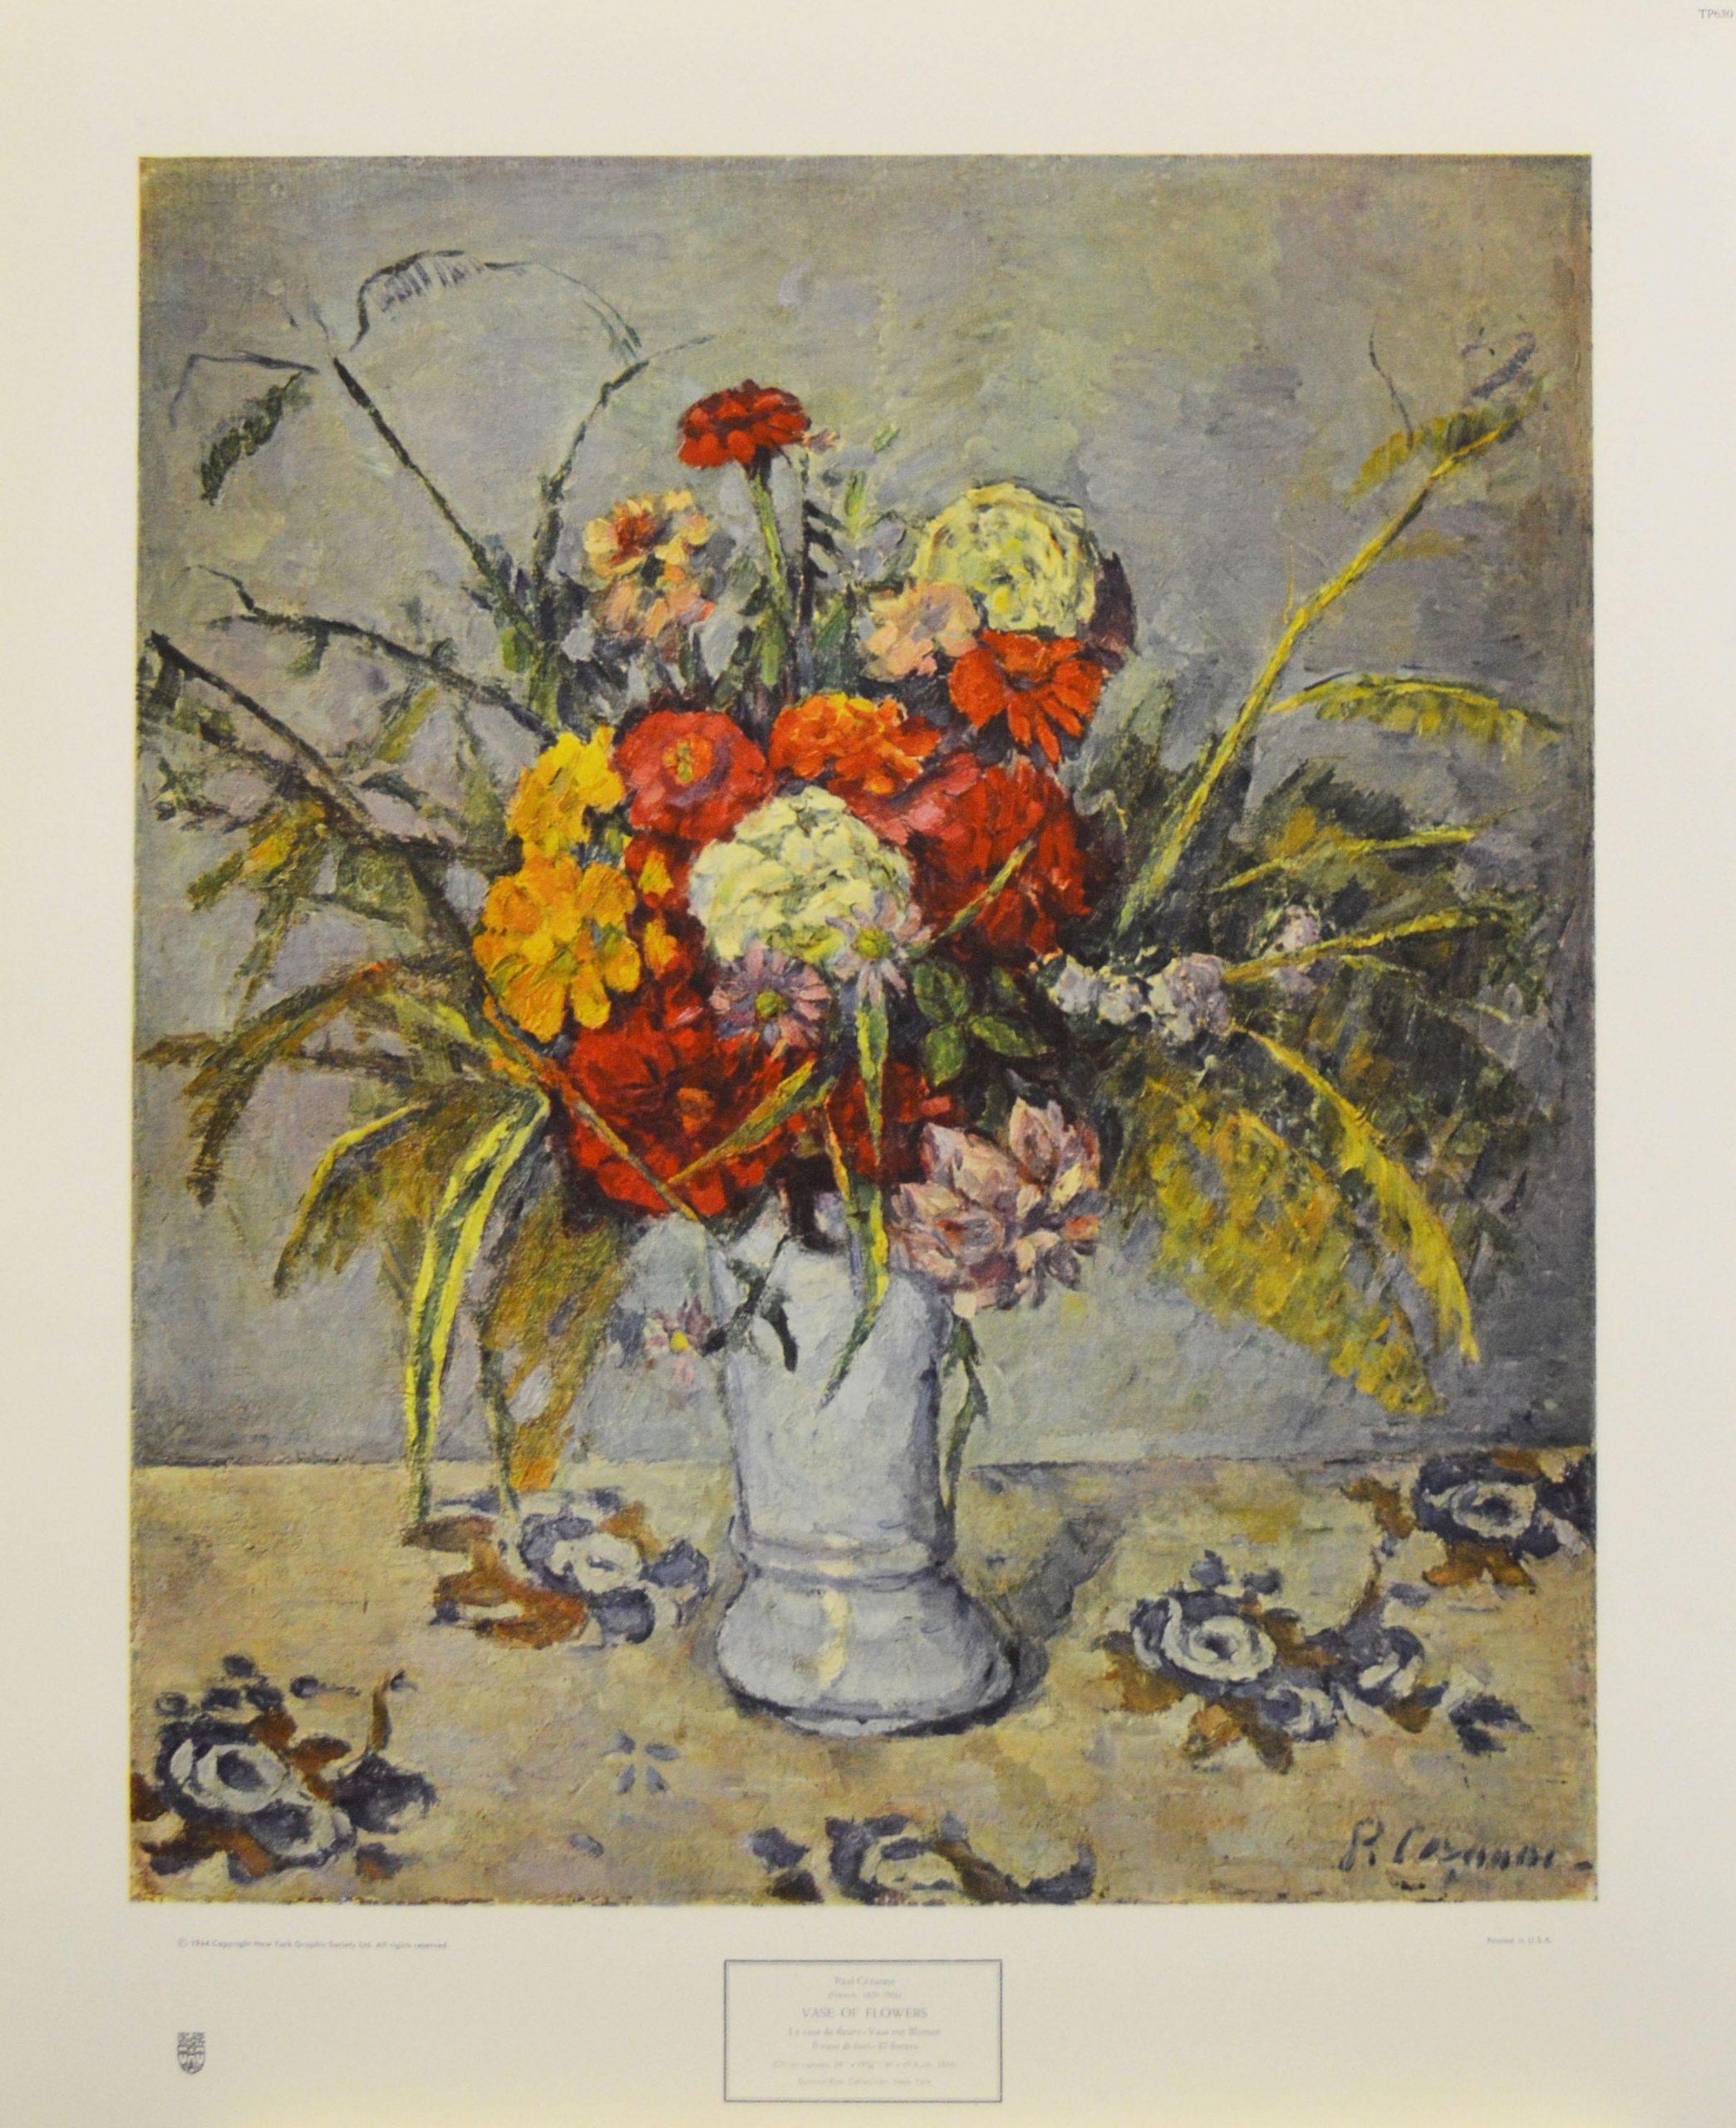 """Vase of Flowers"" Poster. Copyright 1944 New York Graphic Society, Ltd."